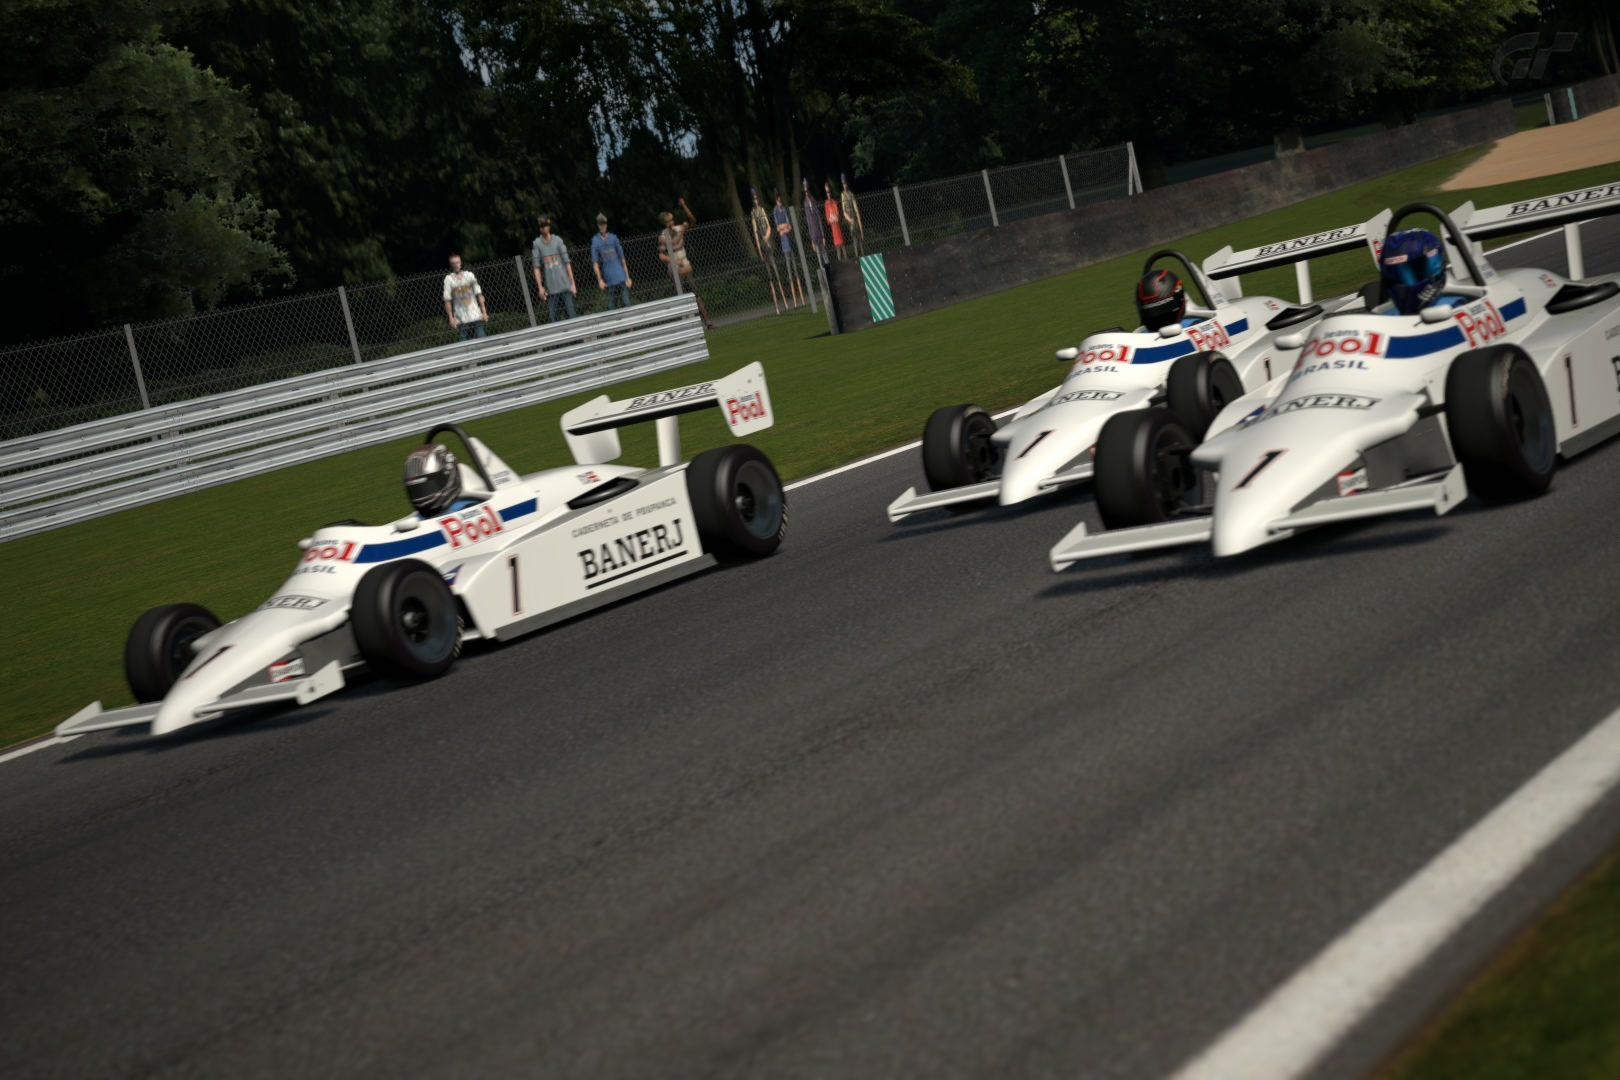 Brands Hatch Grand Prix Circuit '80s_11.jpg